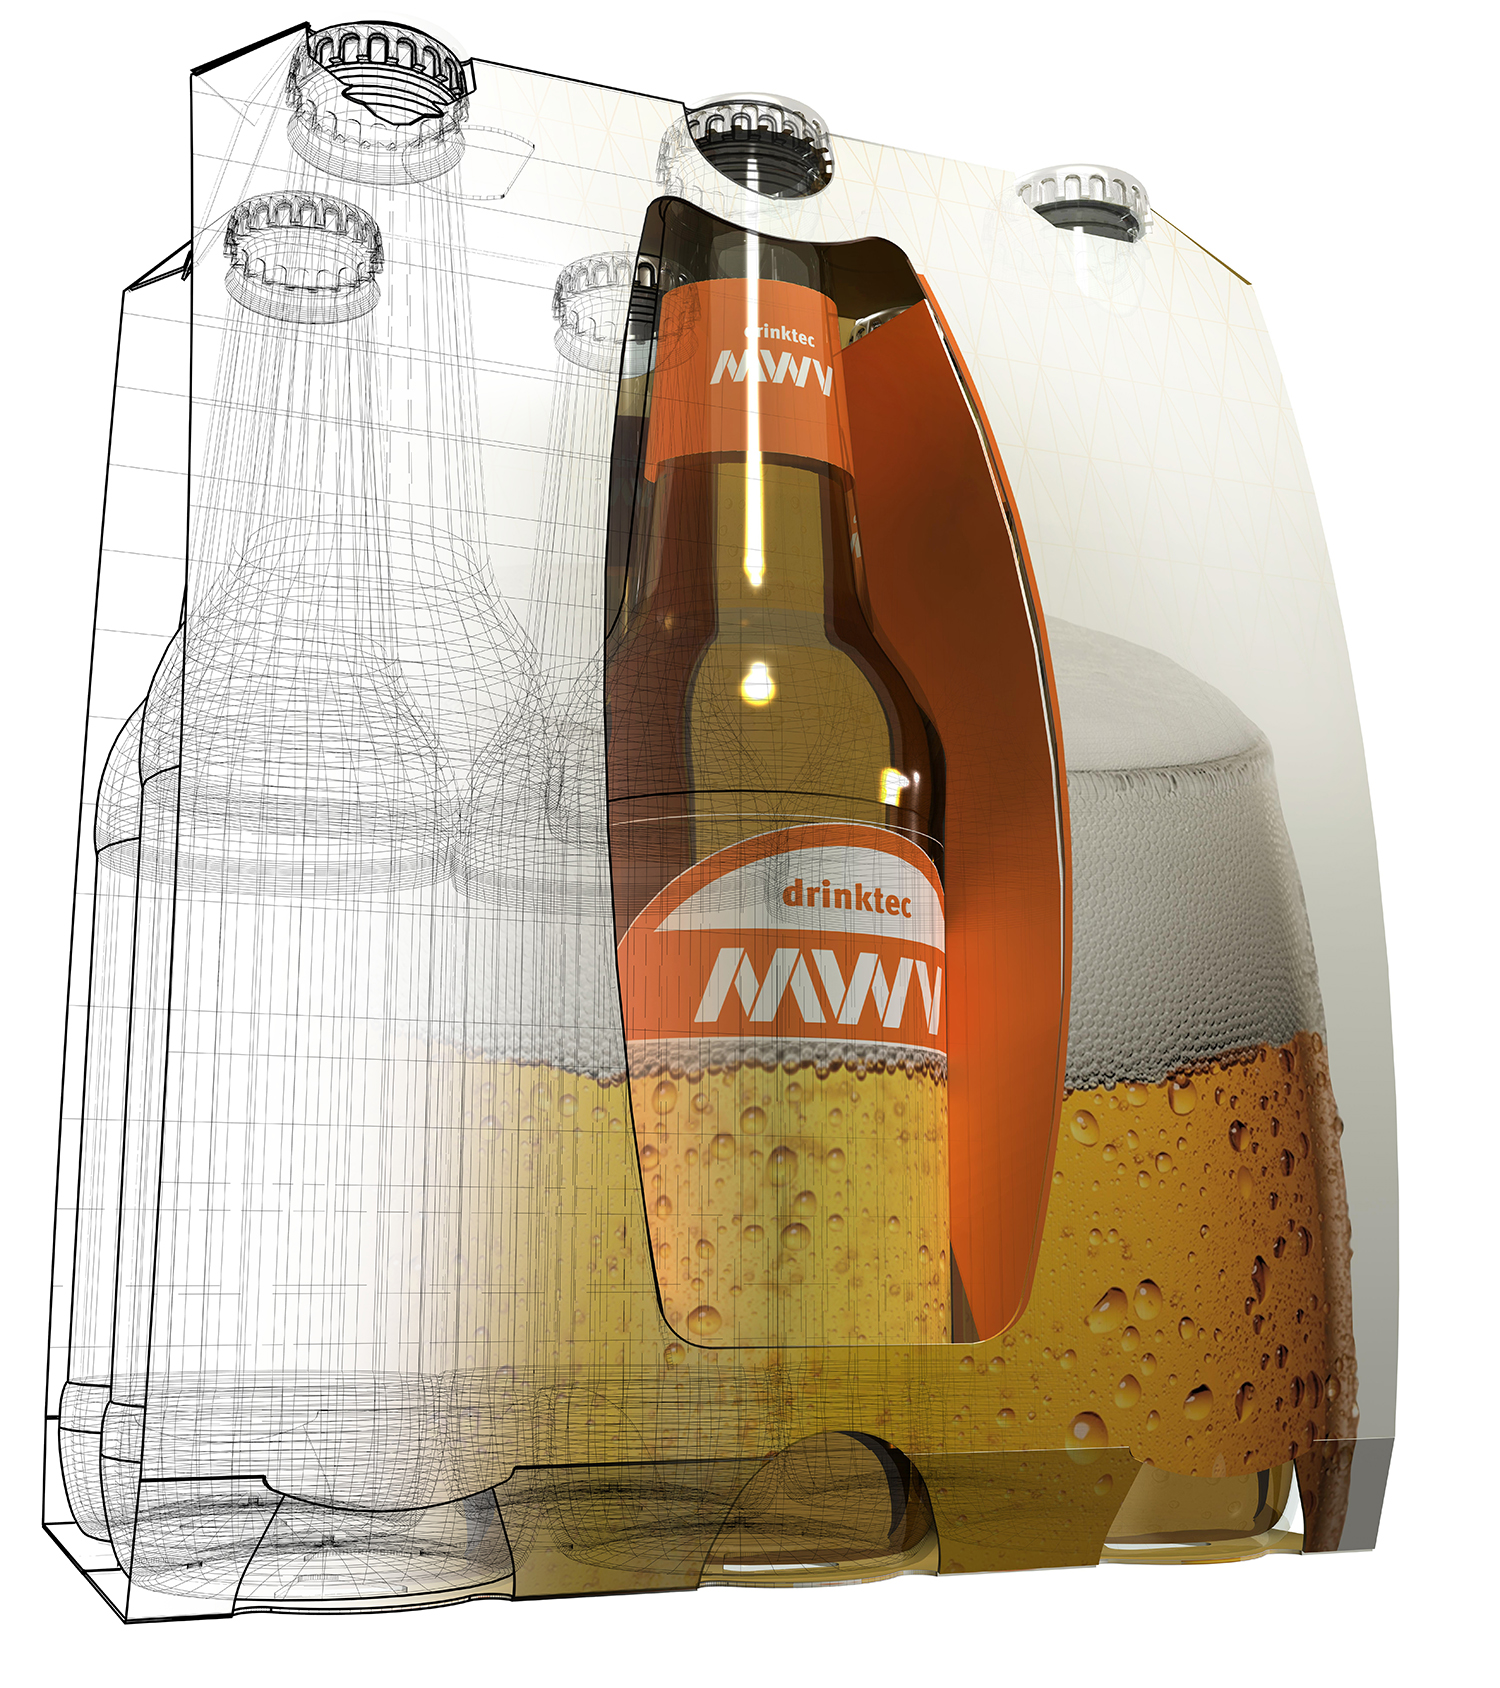 MWV: Packaging Matters™!